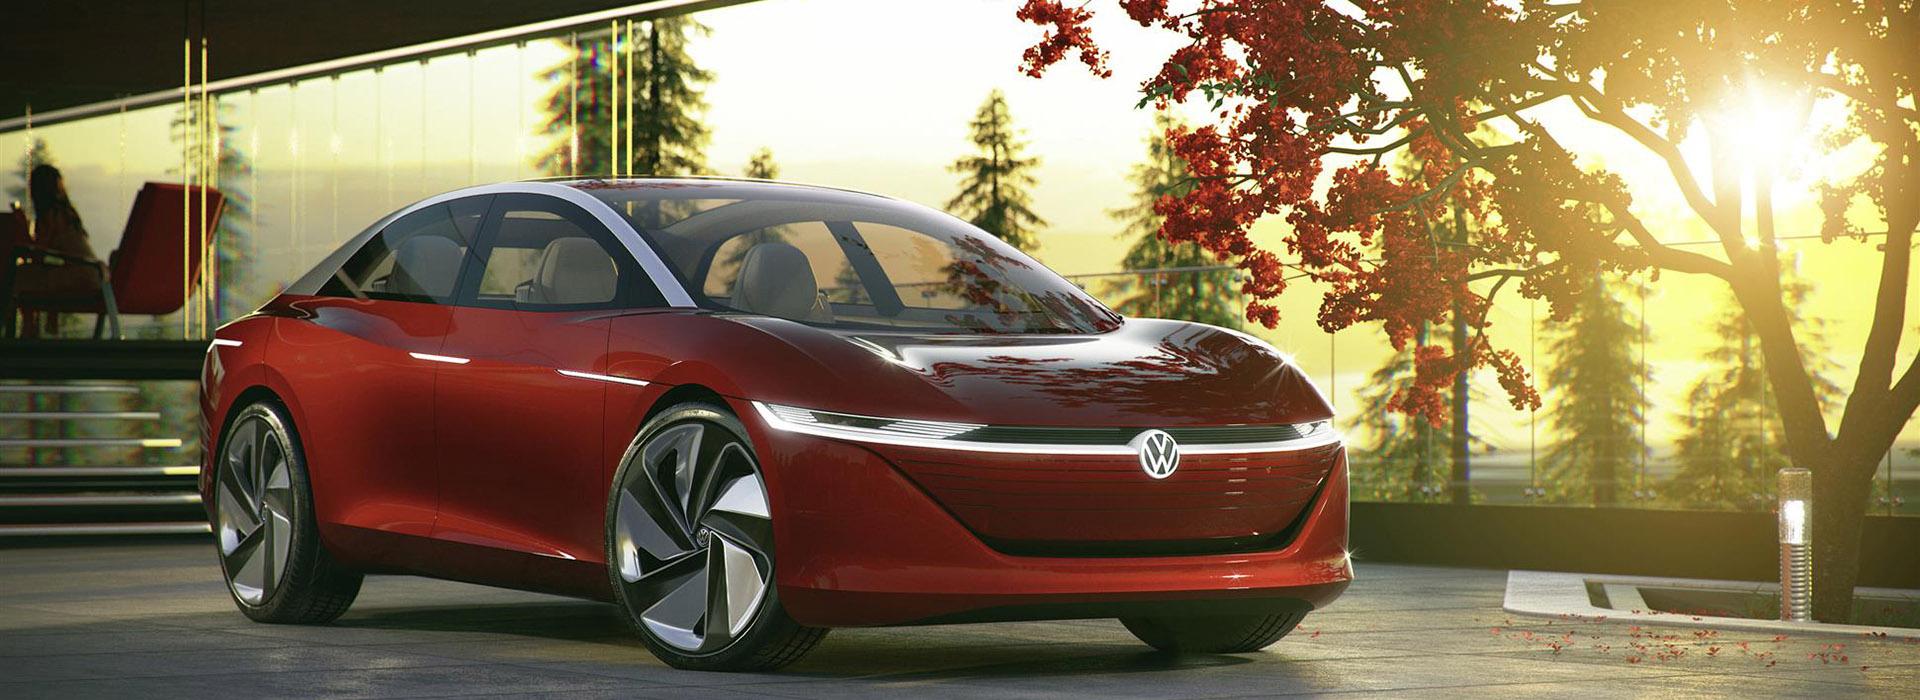 Auto nuove Volkswagen